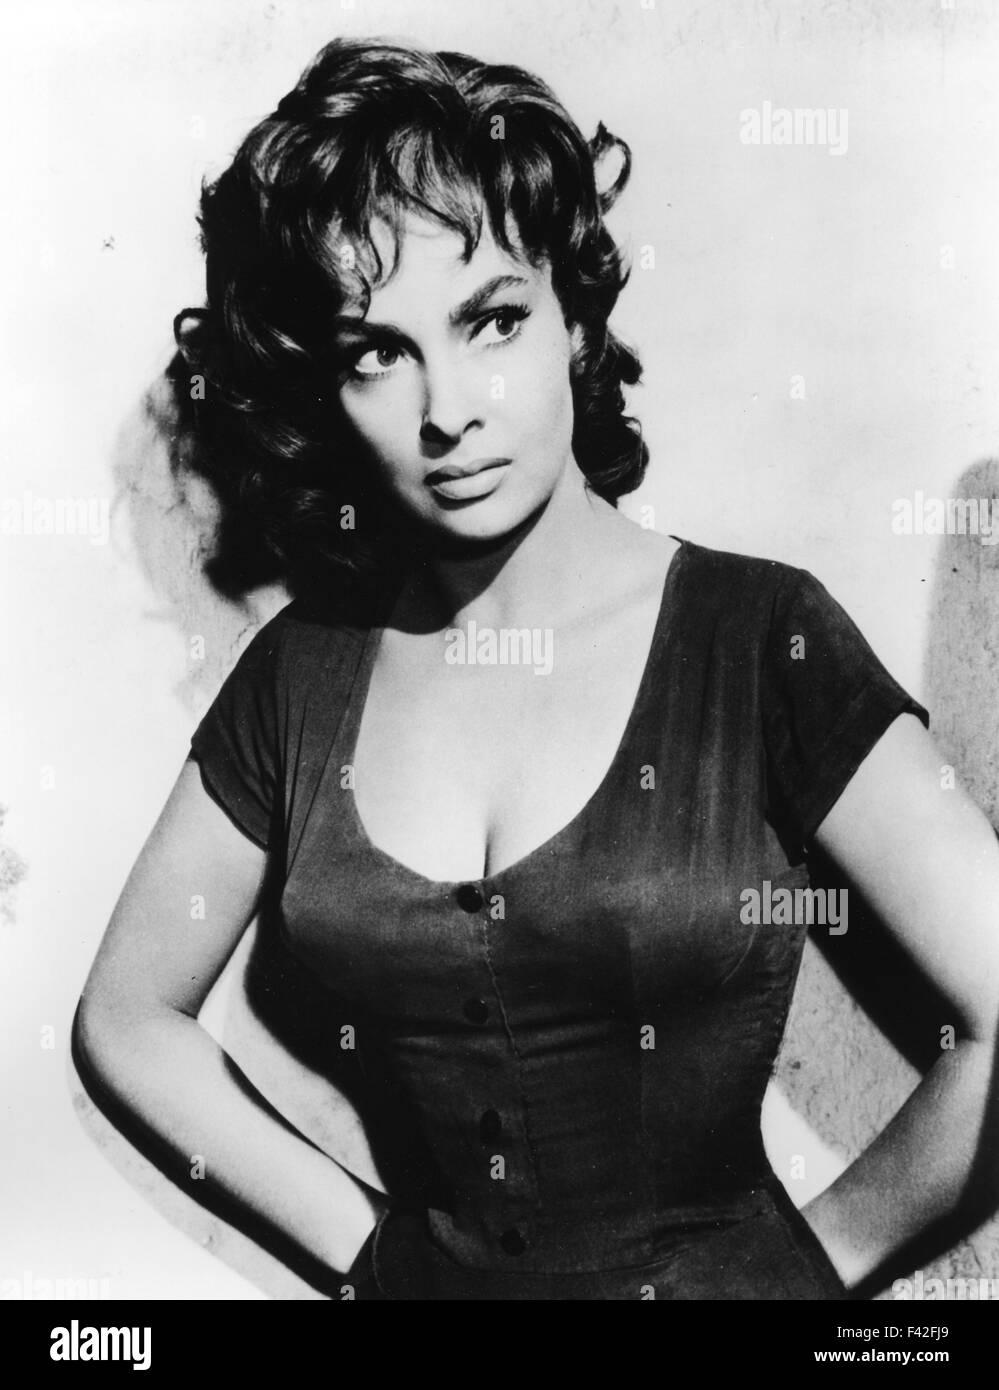 GINA LOLLOBRIGIDA Italian film actress about 1955 Stock